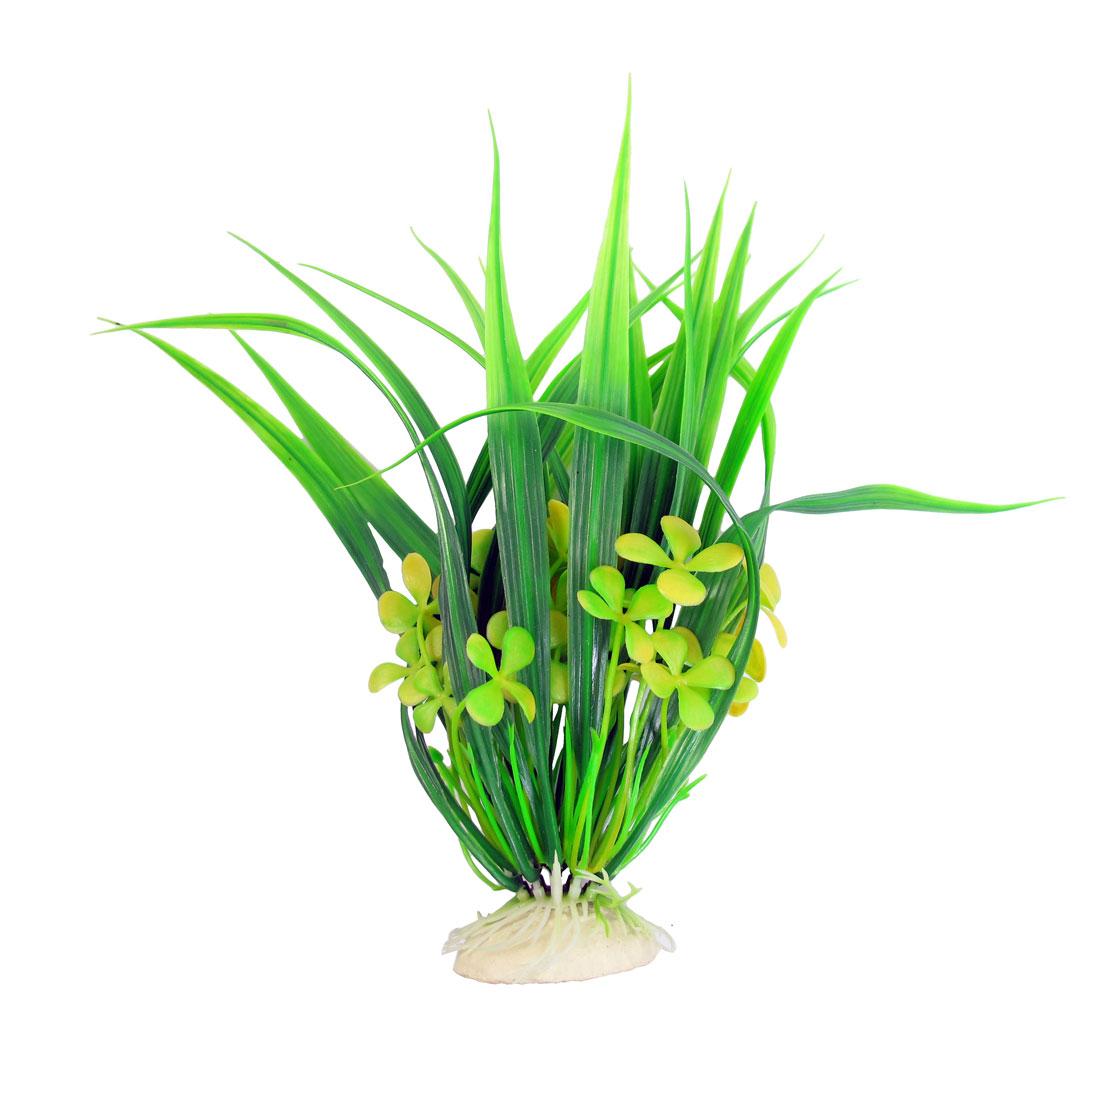 "Aquarium Yellow Plastic Leaves Flower Ornament Plastic Emulational Plant 9.4"" Height"